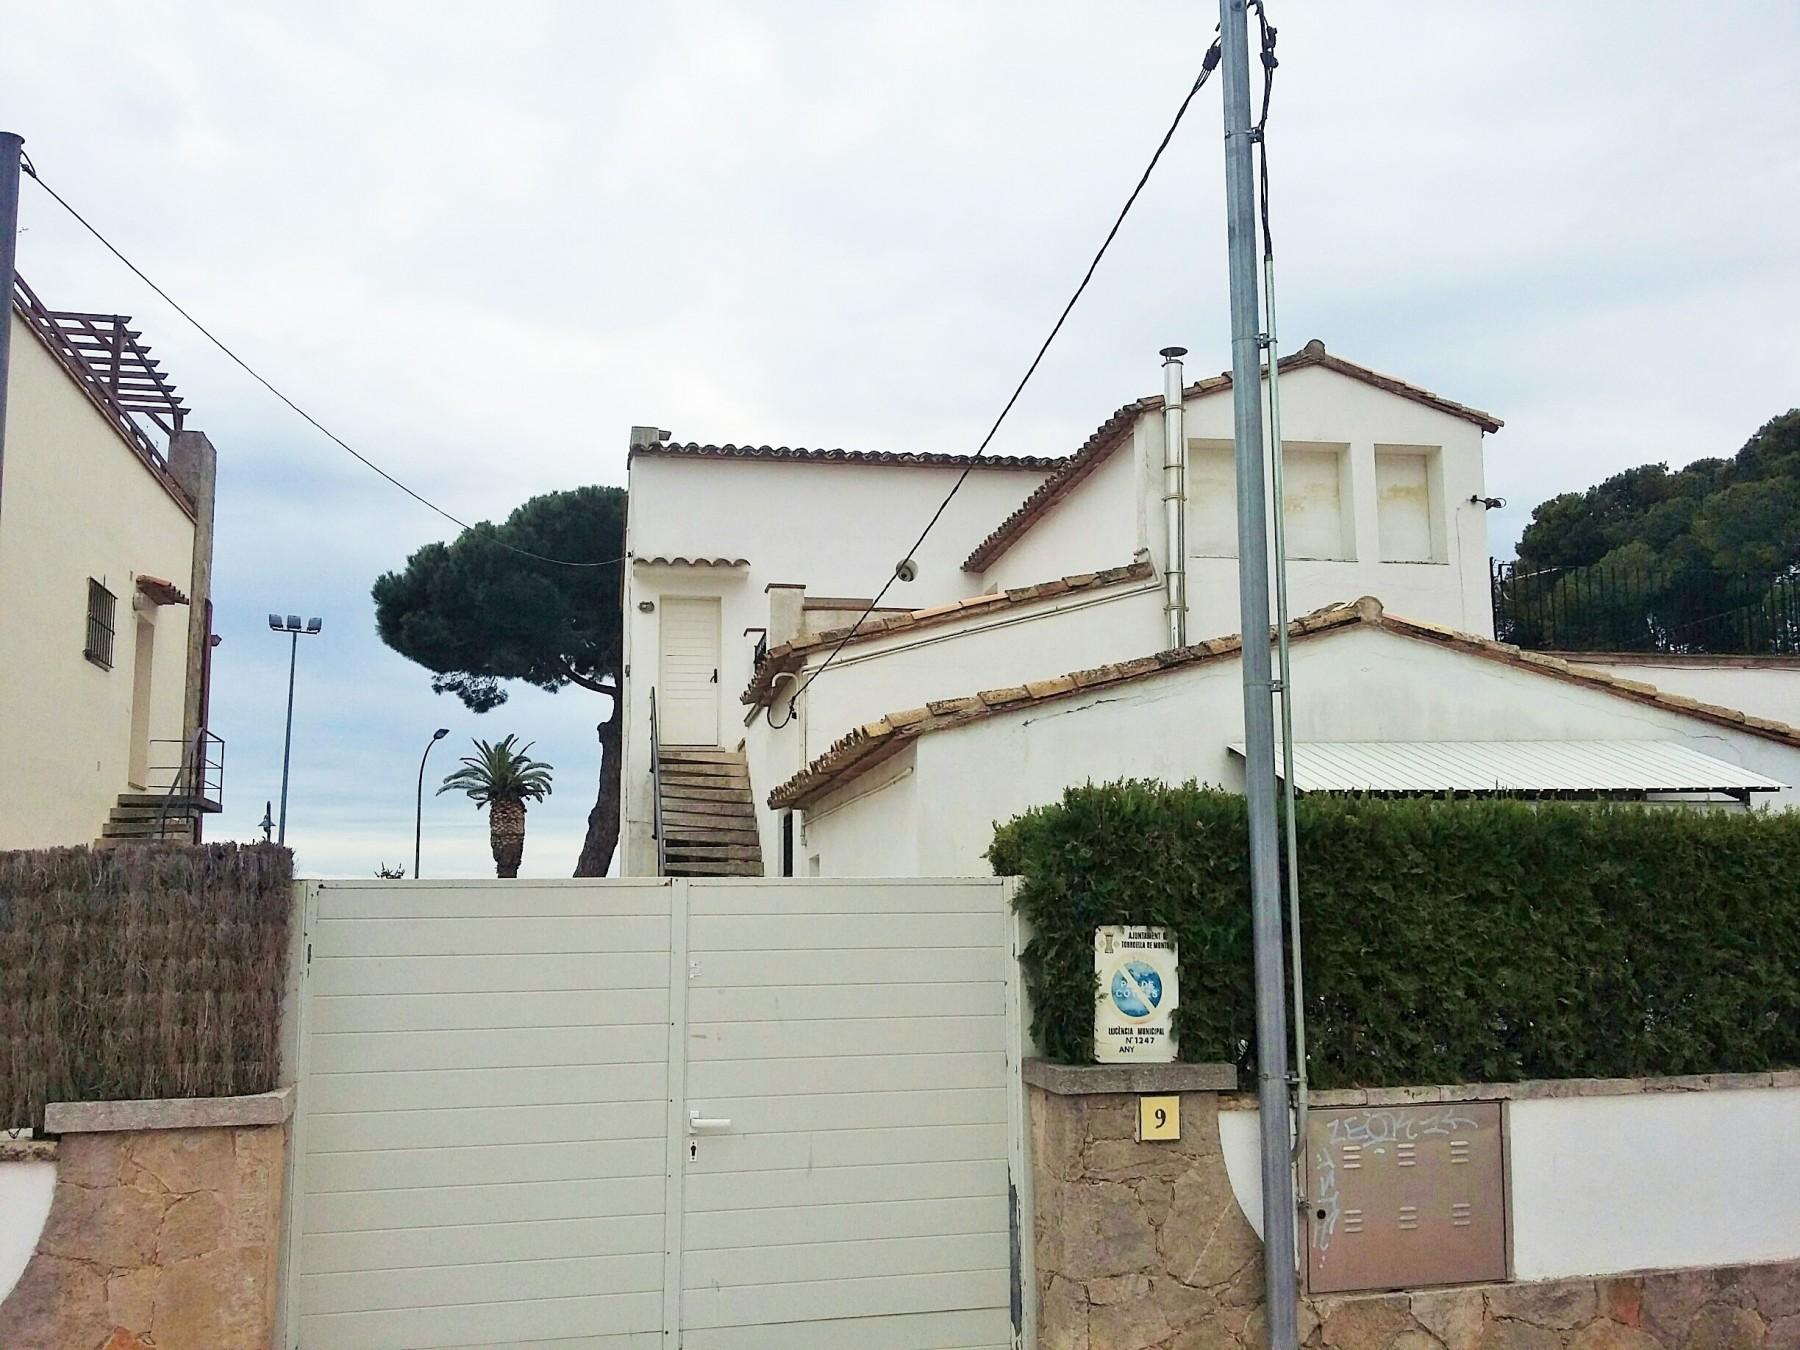 ROMA ATIC for 4 guests in L Estartit, Spain